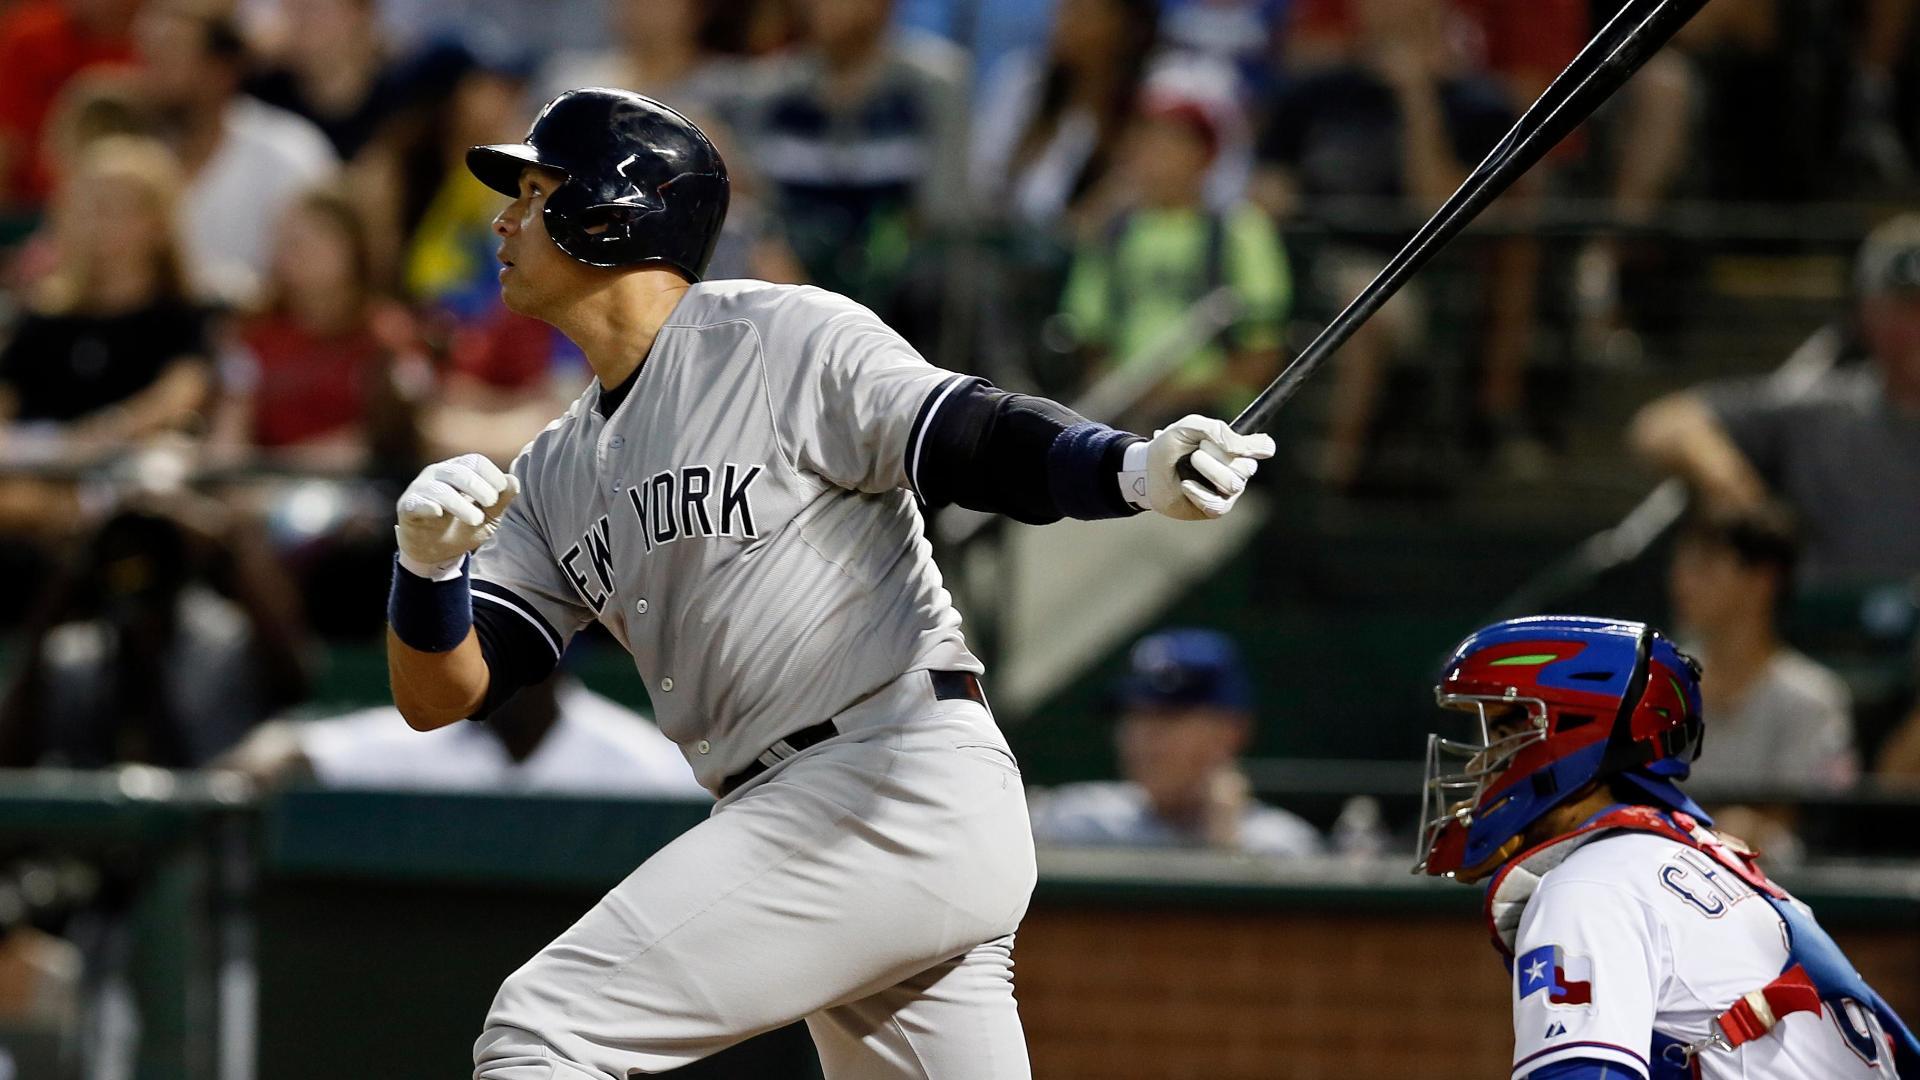 http://a.espncdn.com/media/motion/2015/0728/dm_150727_MLB_OnePlay_ARod_homers_on_his_birthda124/dm_150727_MLB_OnePlay_ARod_homers_on_his_birthda124.jpg